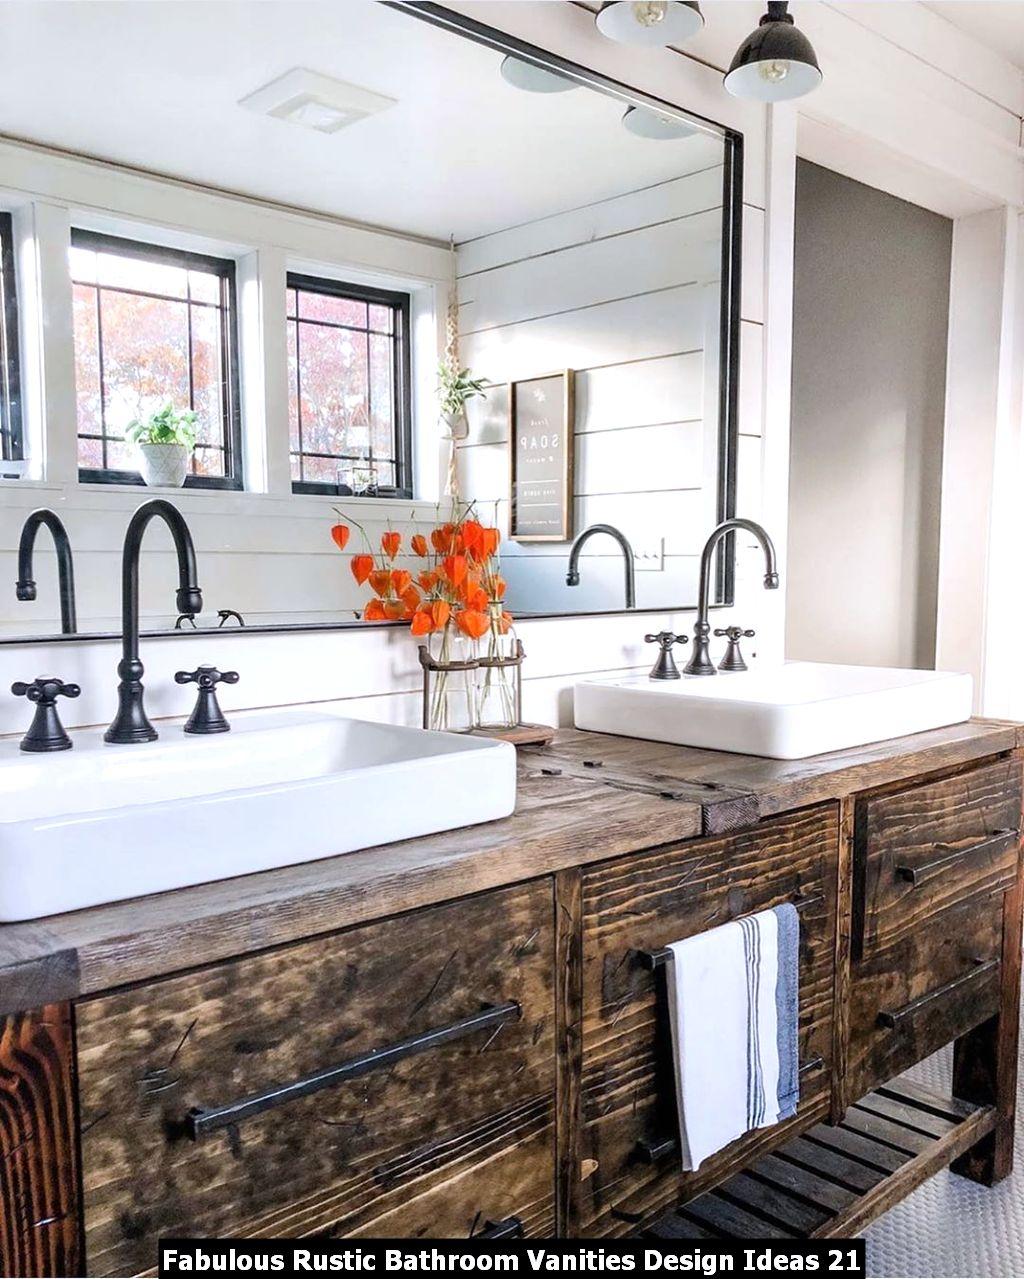 Fabulous Rustic Bathroom Vanities Design Ideas 21